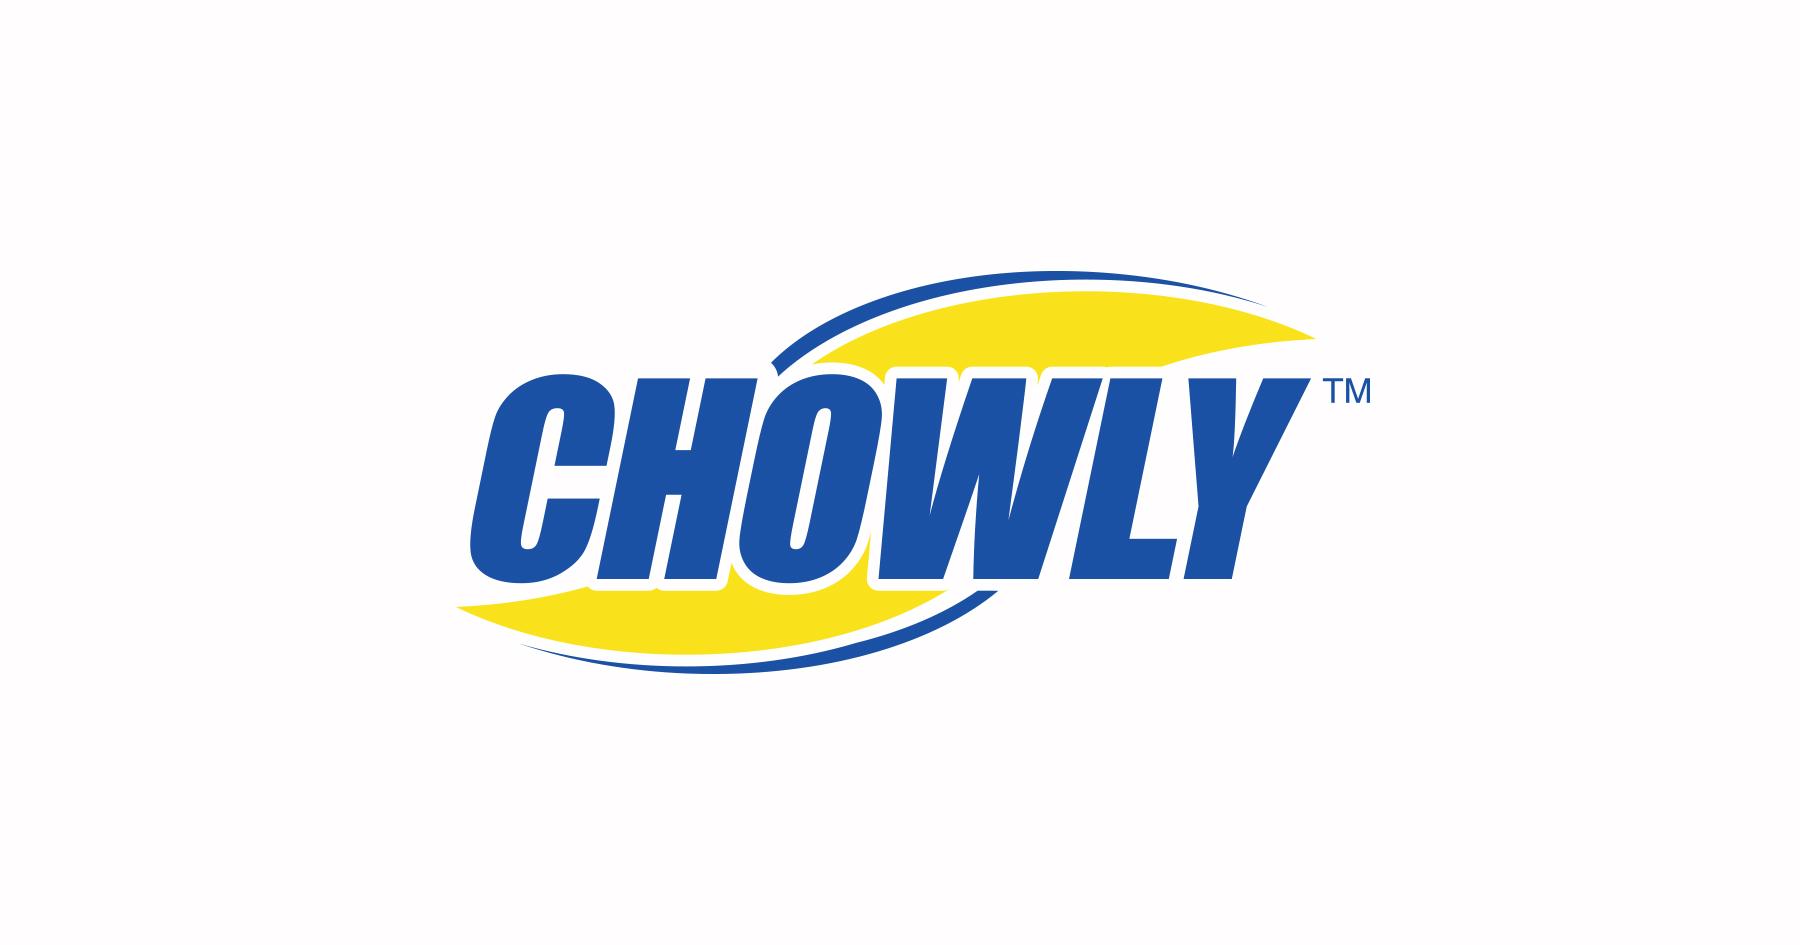 Chowly_Weblogo_headshot_1541624681.jpg